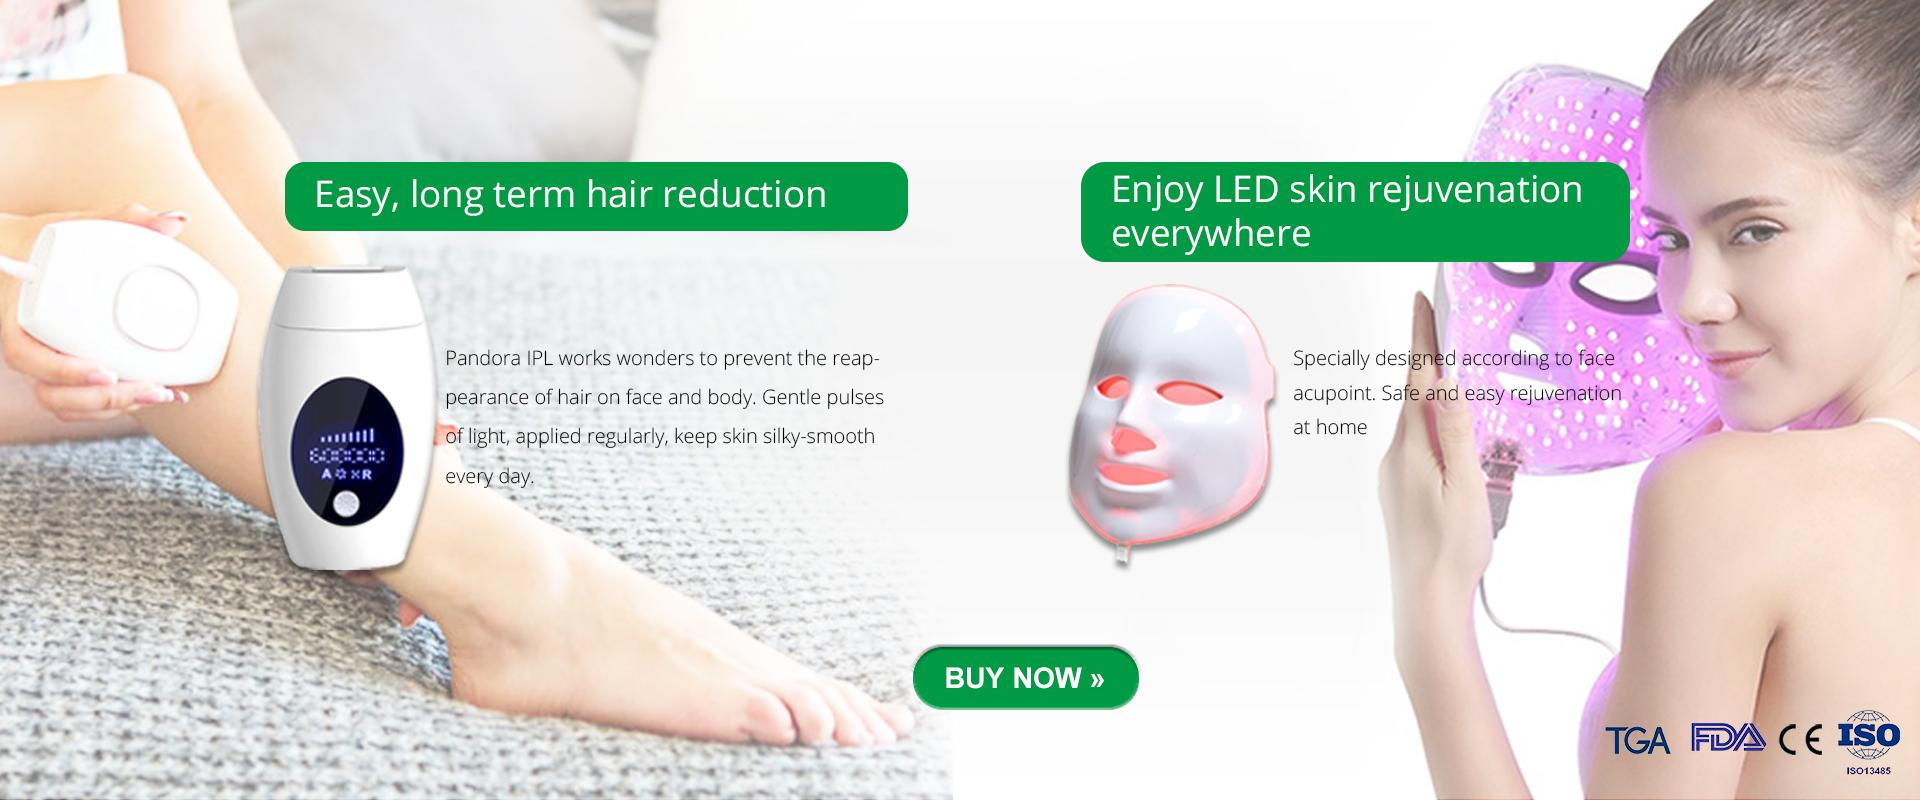 LED facemask